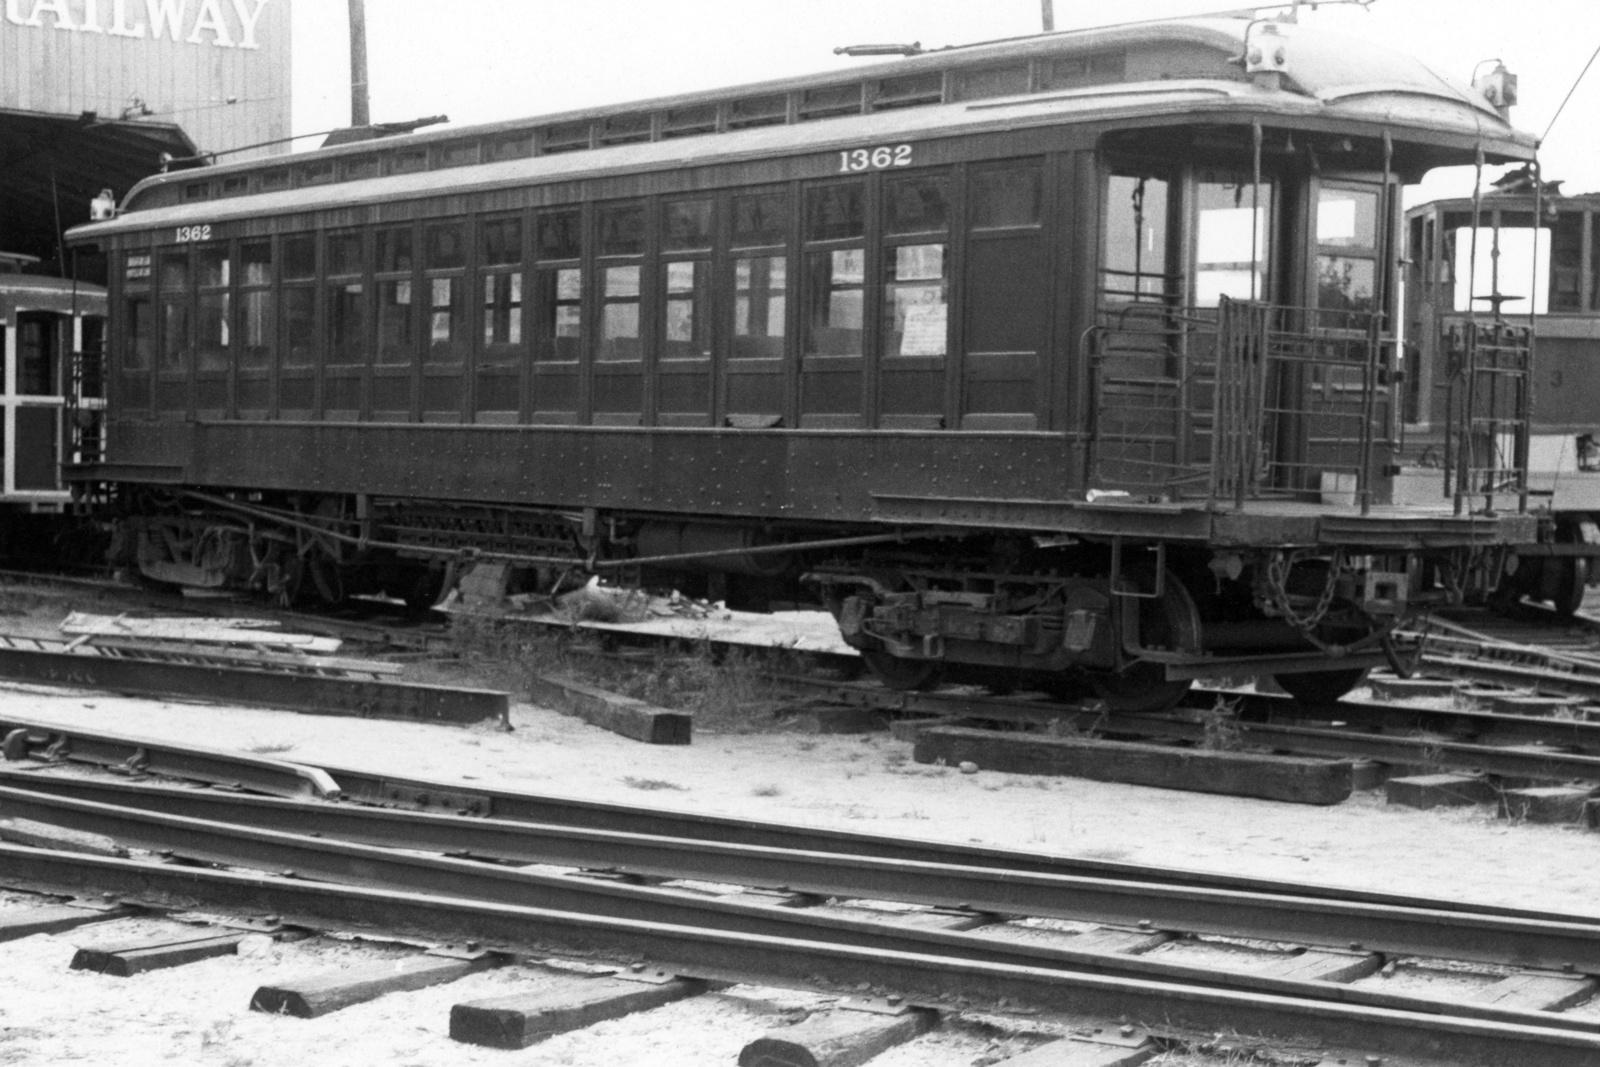 (527k, 1600x1067)<br><b>Country:</b> United States<br><b>City:</b> East Haven/Branford, Ct.<br><b>System:</b> Shore Line Trolley Museum<br><b>Car:</b> BMT Elevated Gate Car 1362 <br><b>Collection of:</b> Nicholas Fabrizio<br><b>Viewed (this week/total):</b> 0 / 55